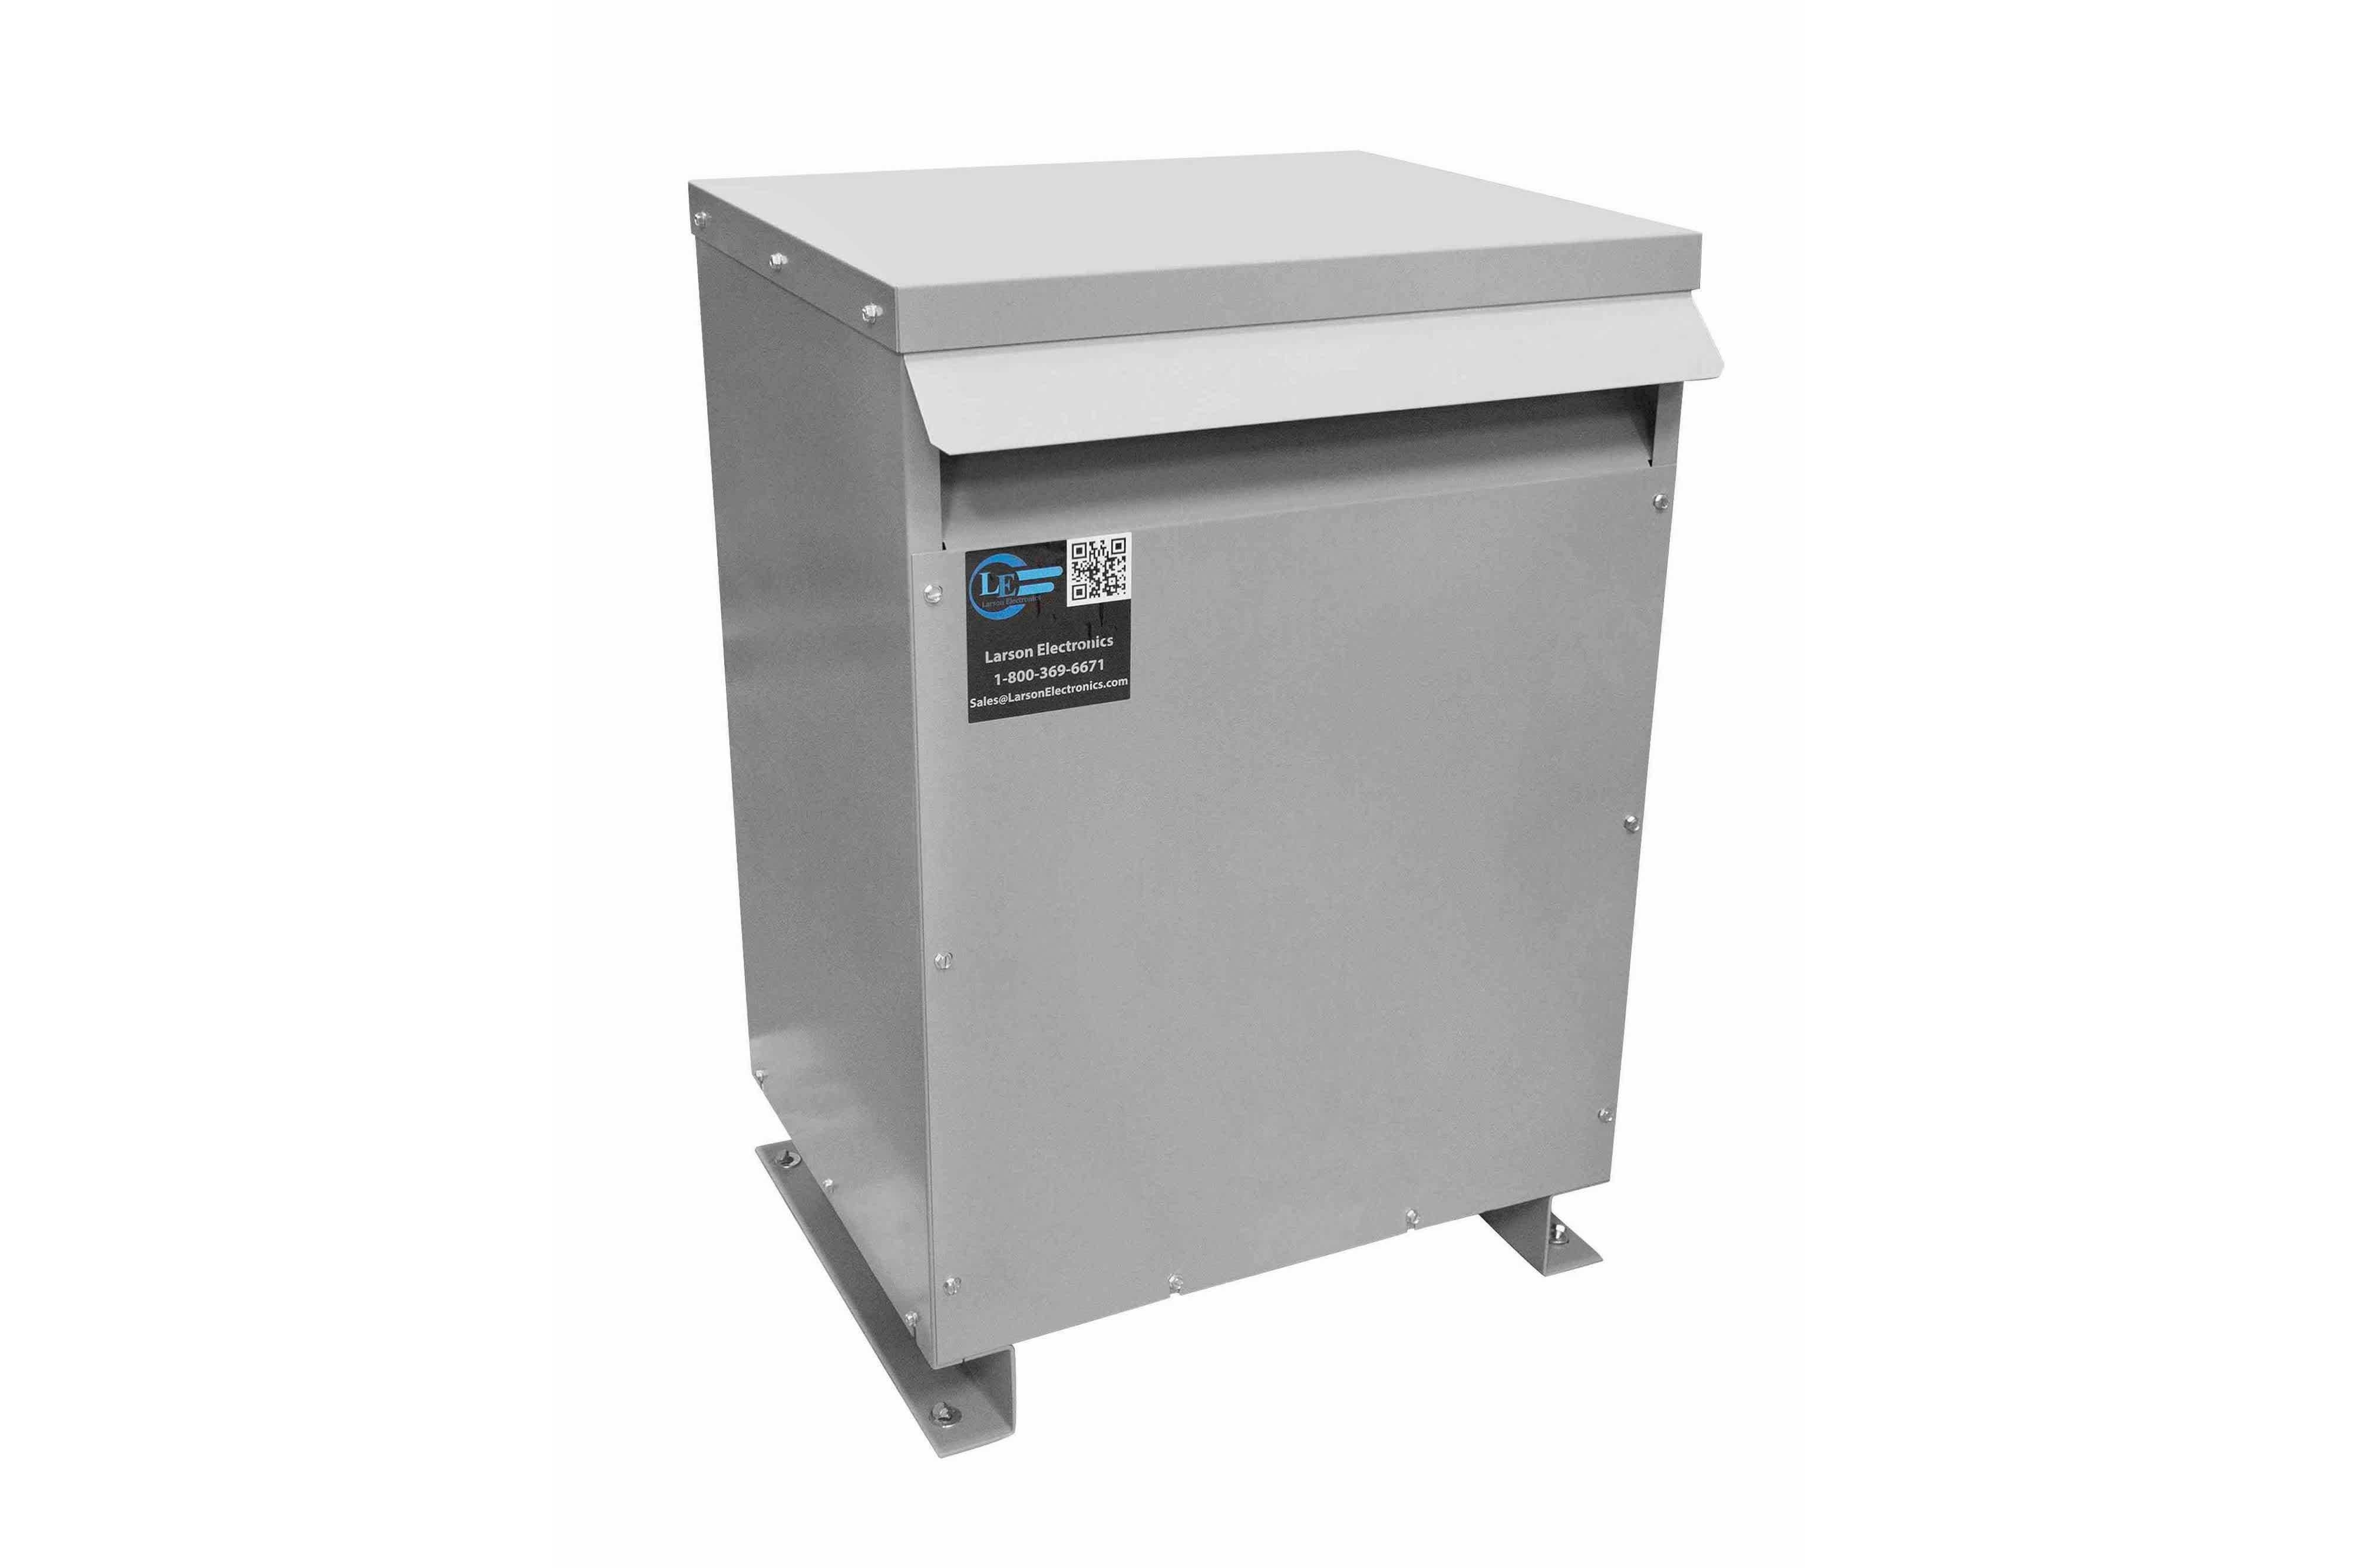 55 kVA 3PH Isolation Transformer, 460V Wye Primary, 400V Delta Secondary, N3R, Ventilated, 60 Hz